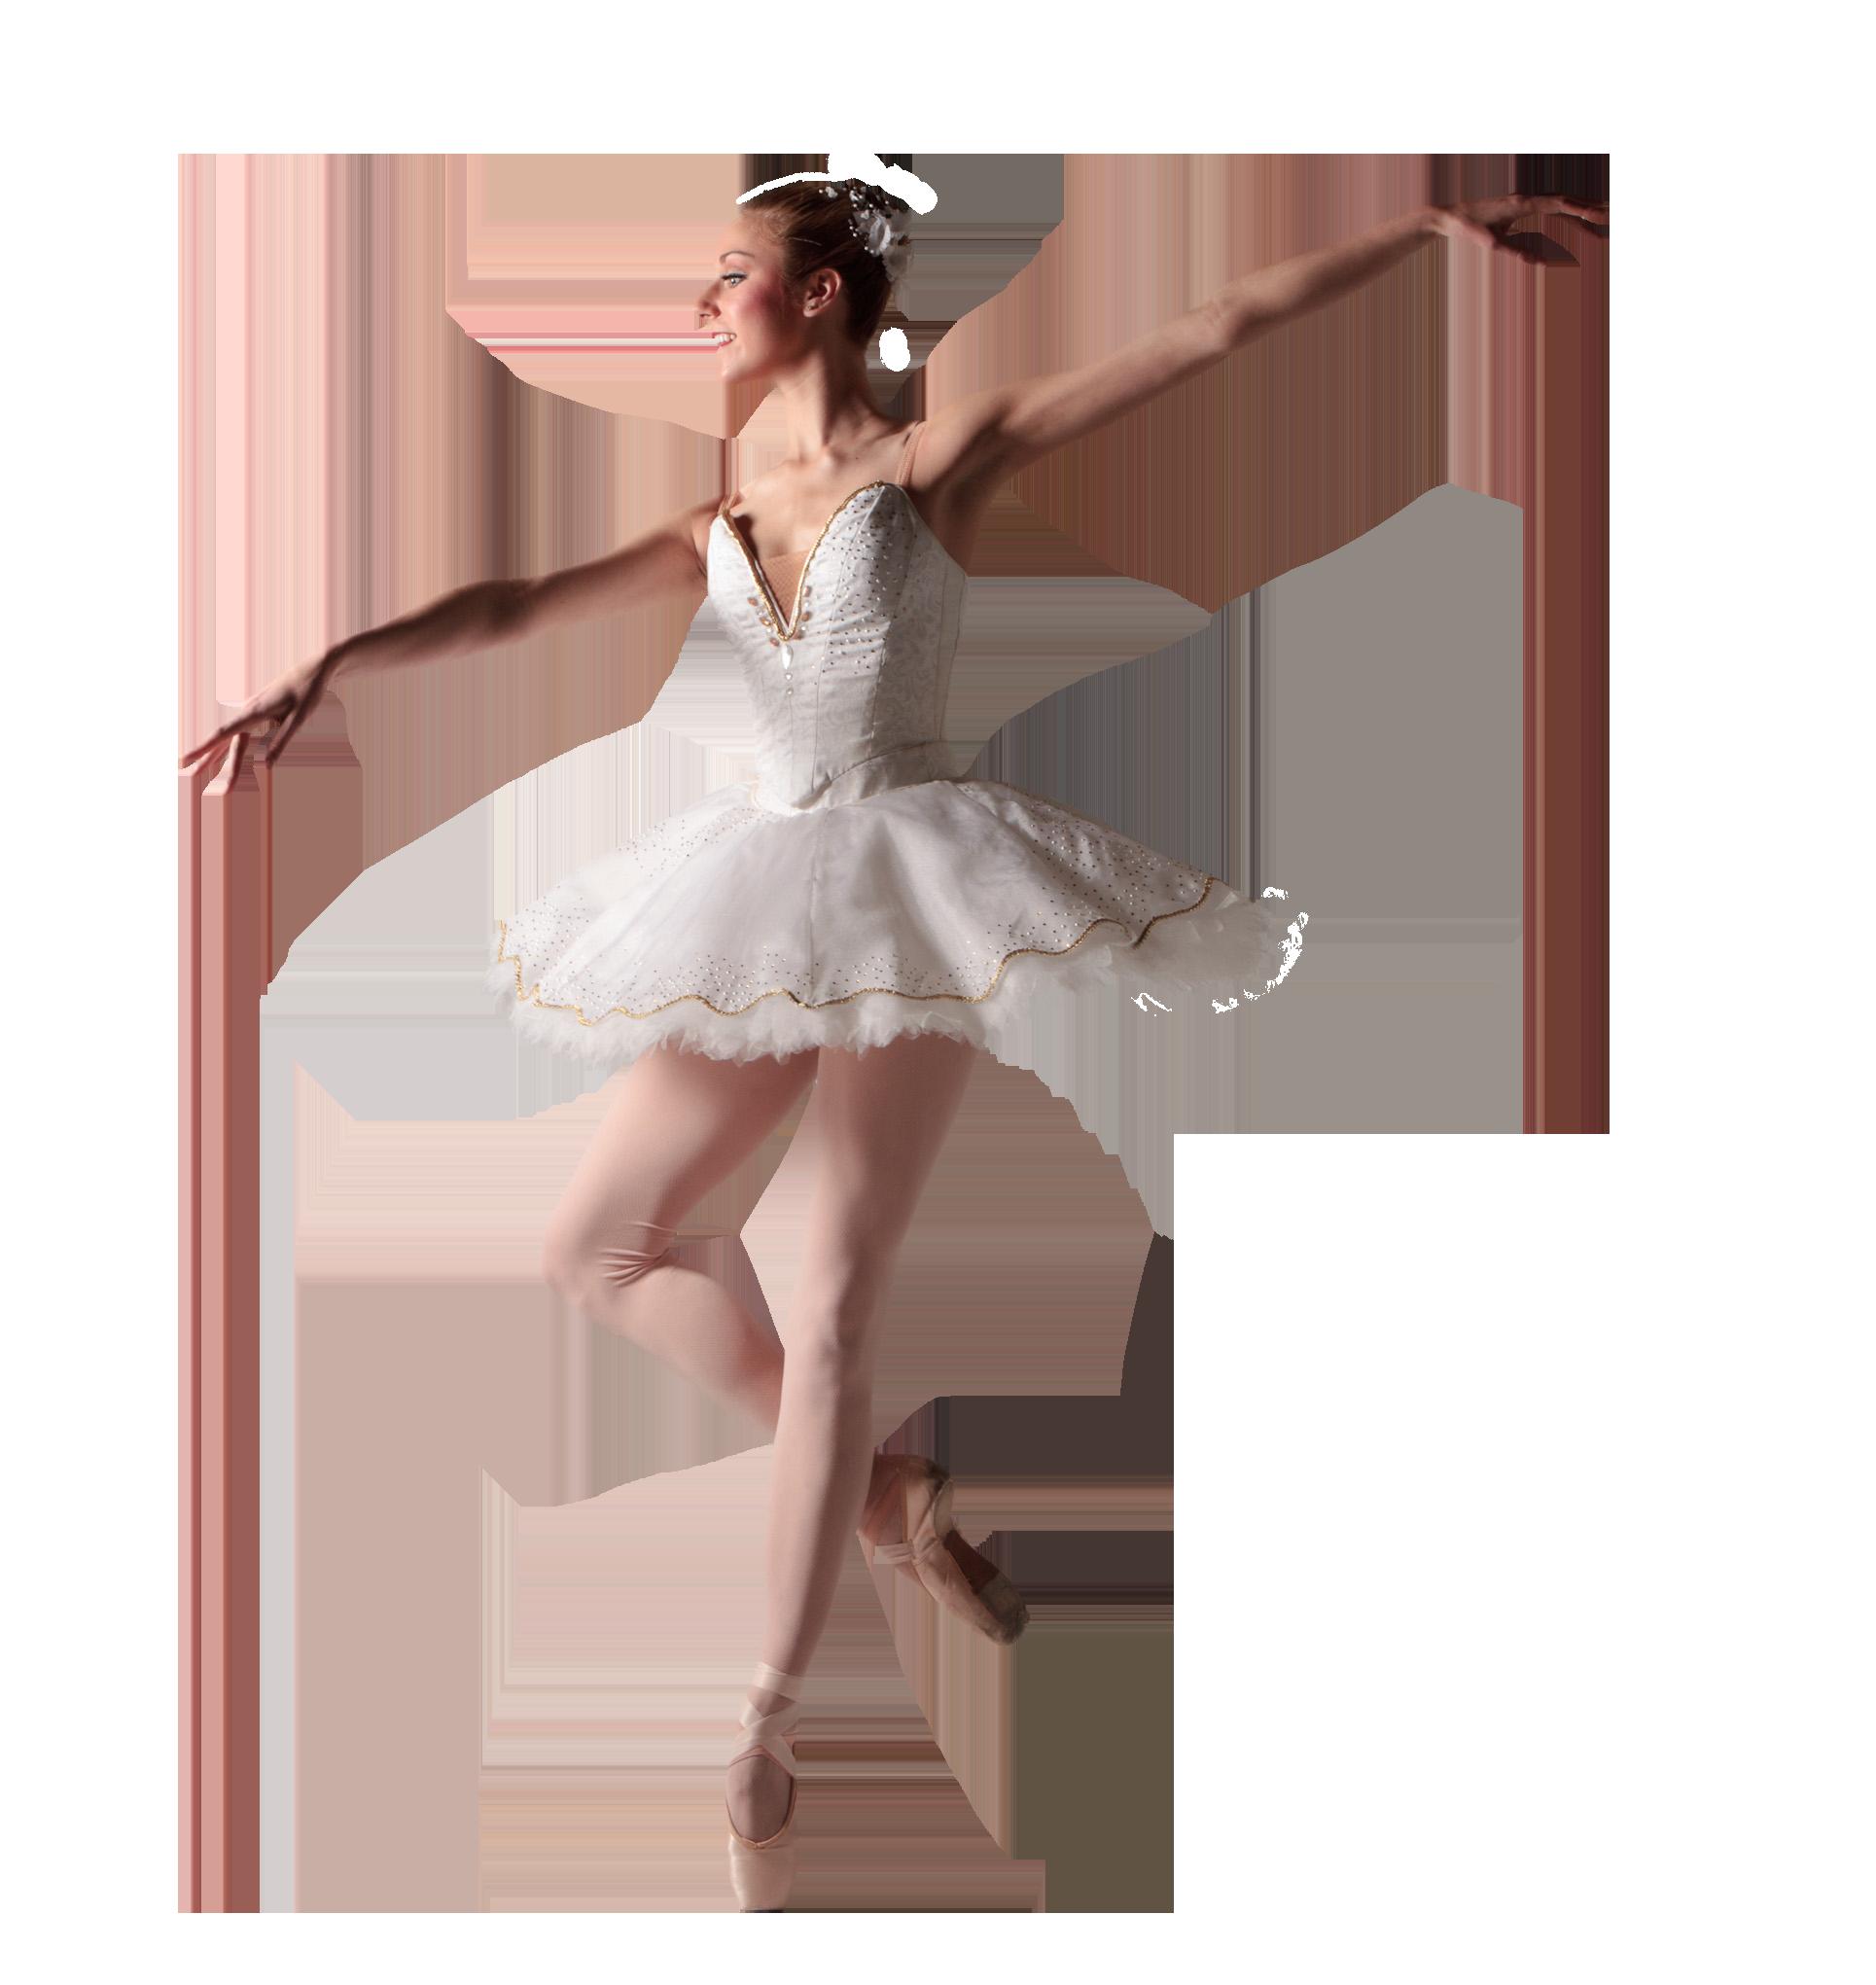 fuck-amateur-ballet-dancer-wie-swallow-cum